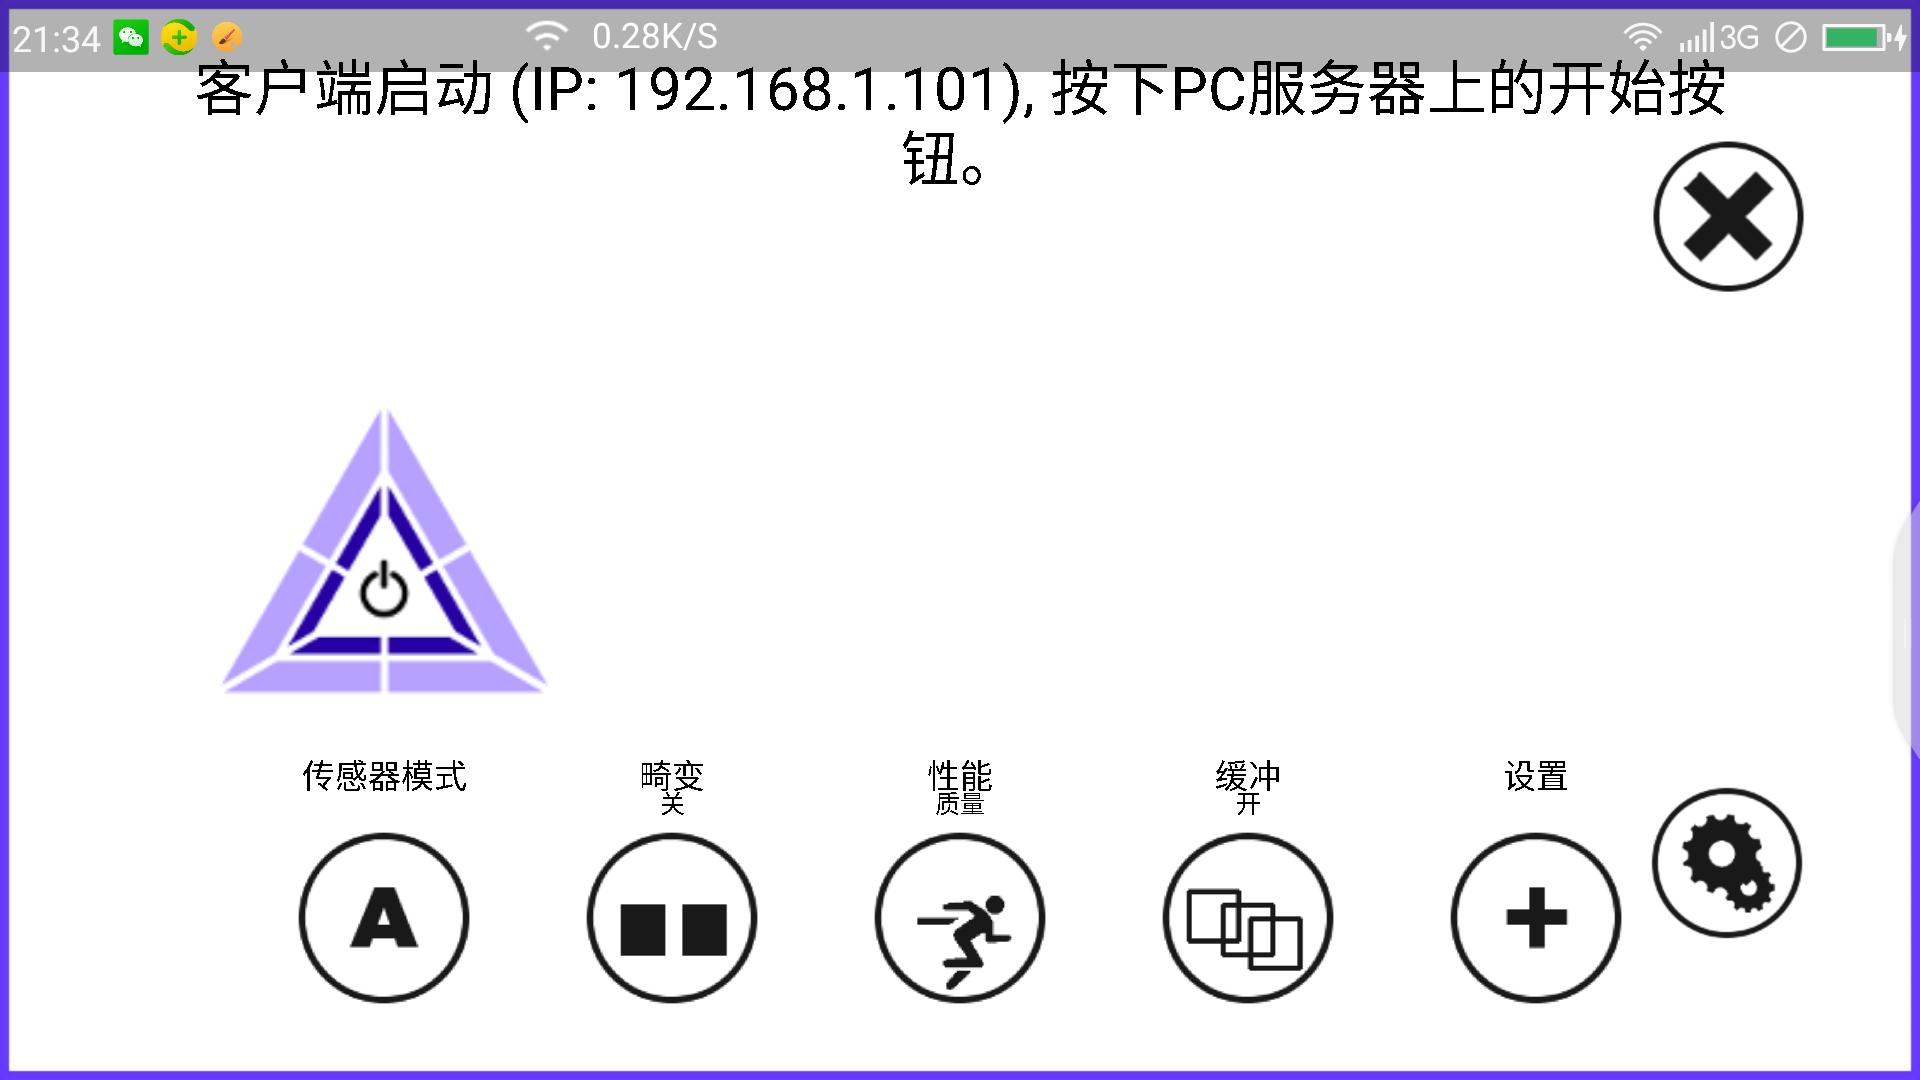 Screenshot_2017-08-10-21-34-55[1].png